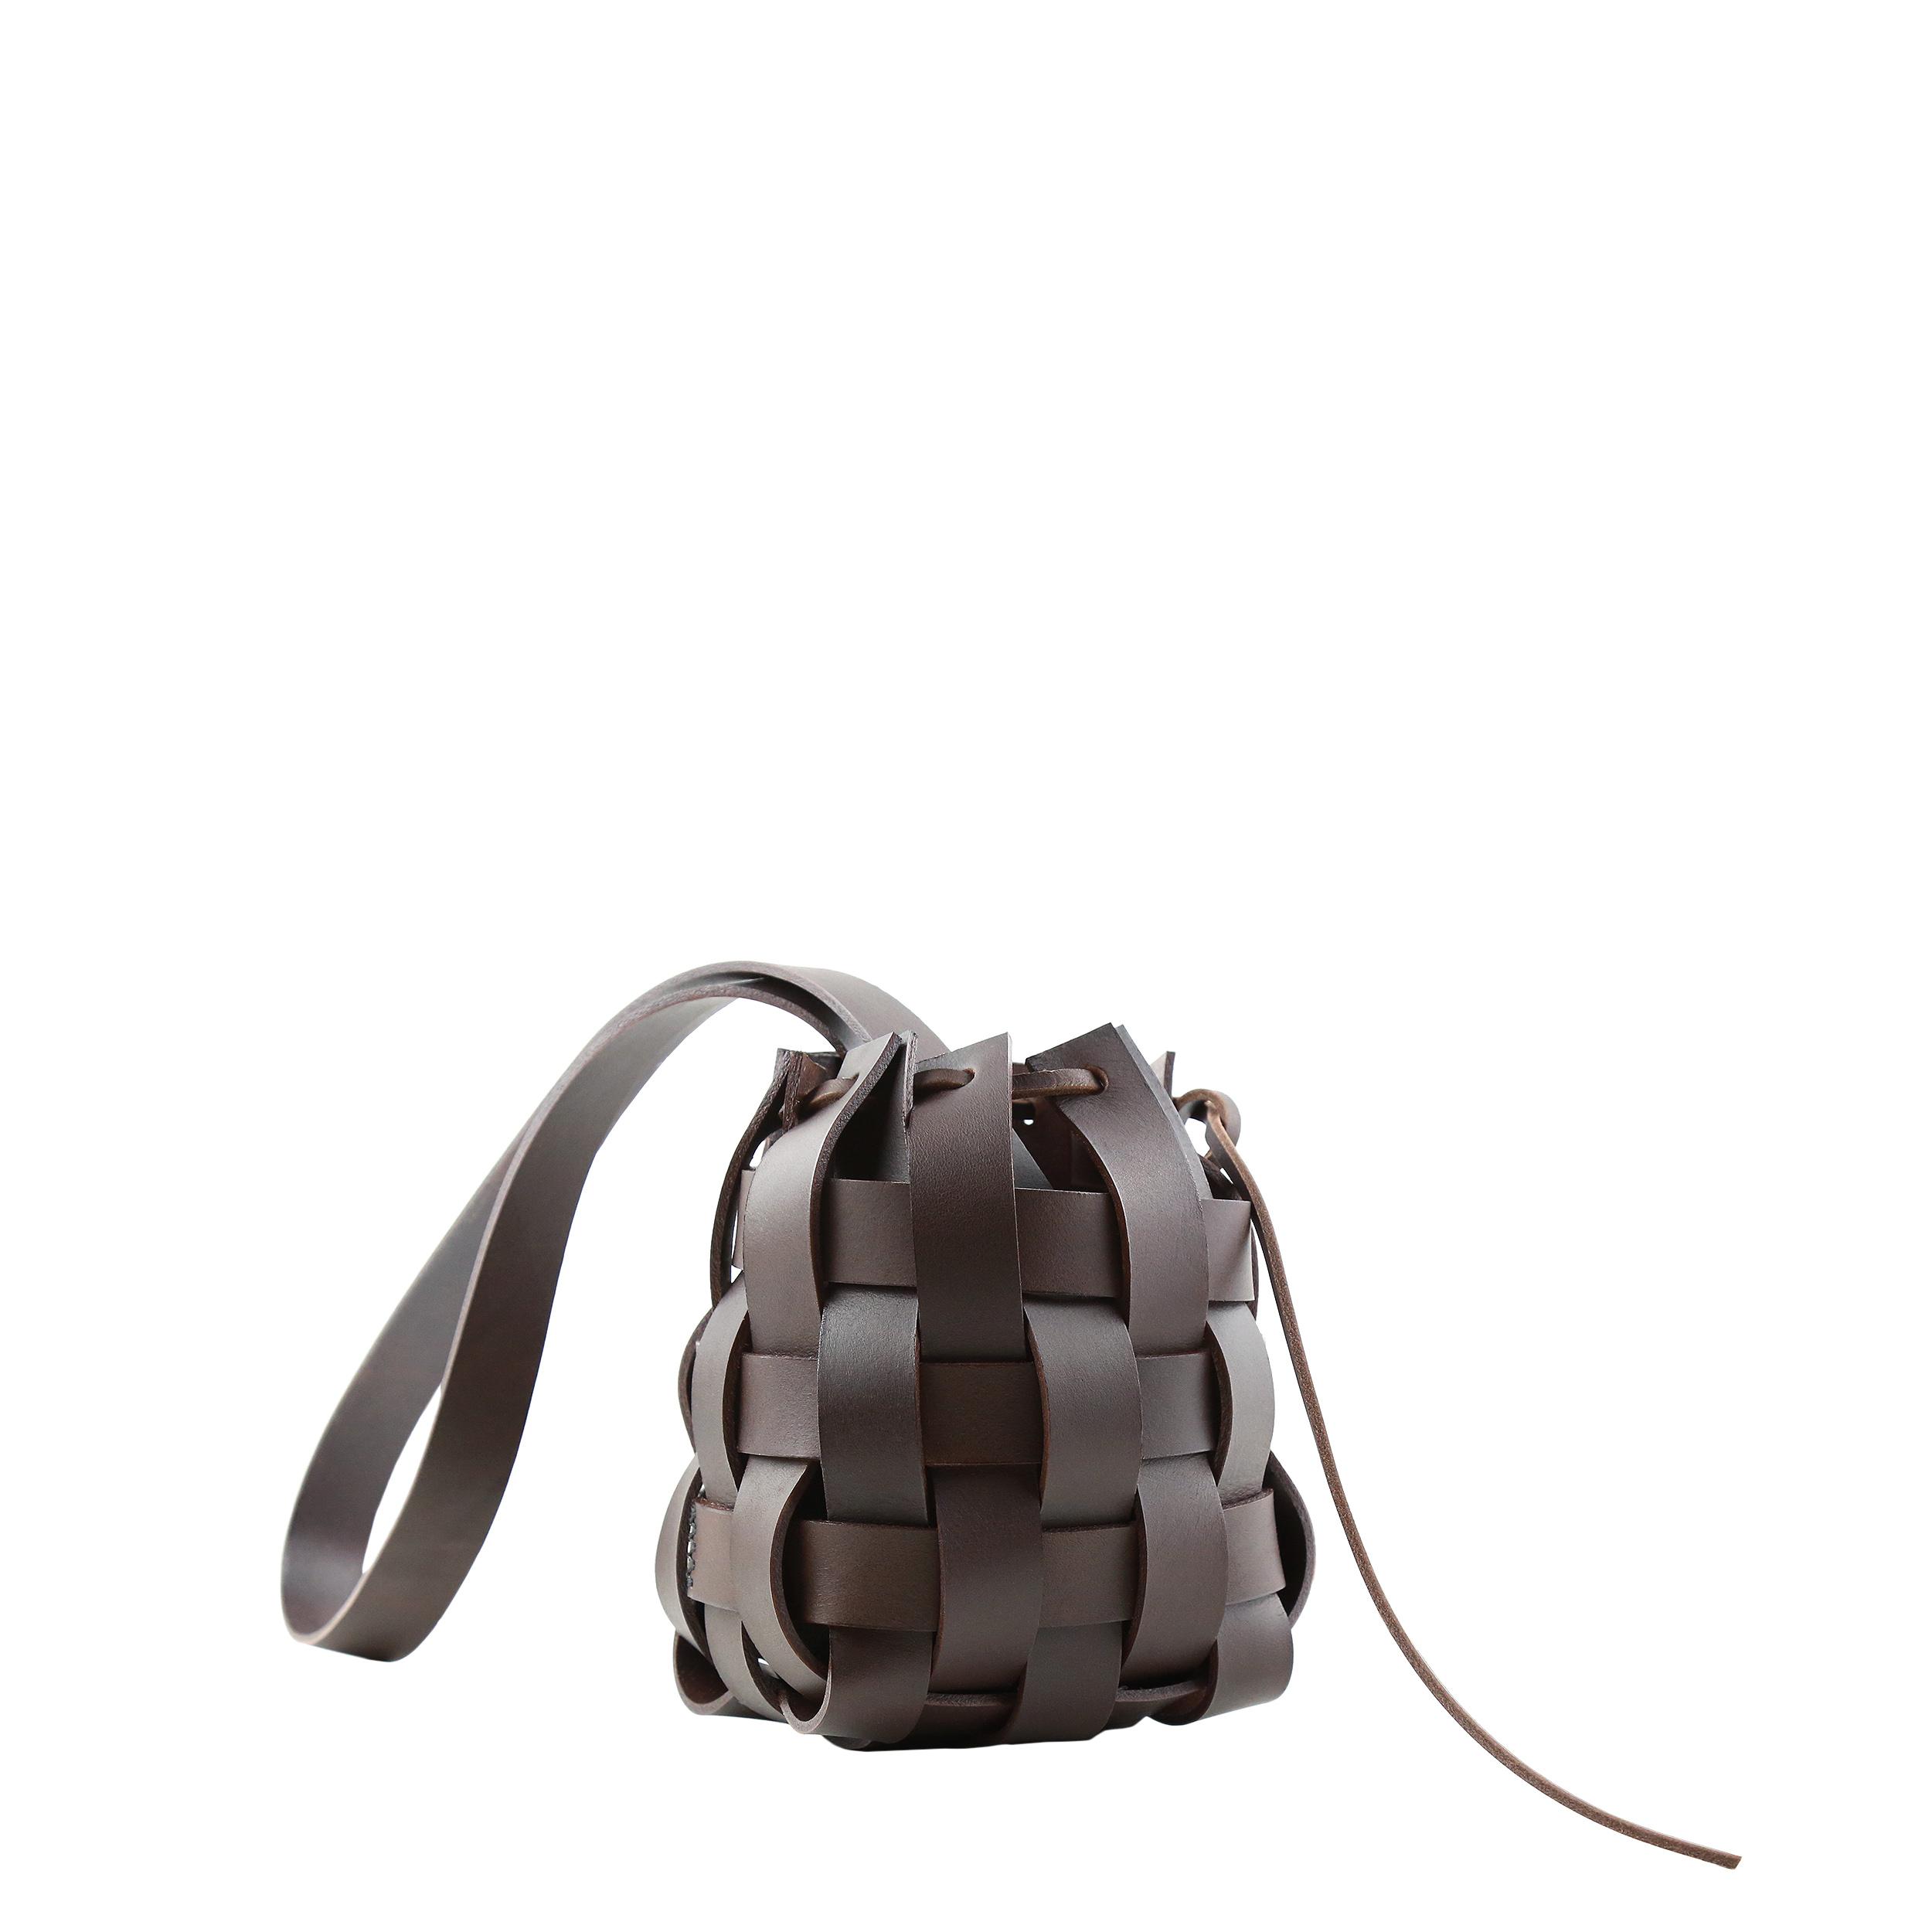 Pane Woven Basket Bag Dark Chocolate-1